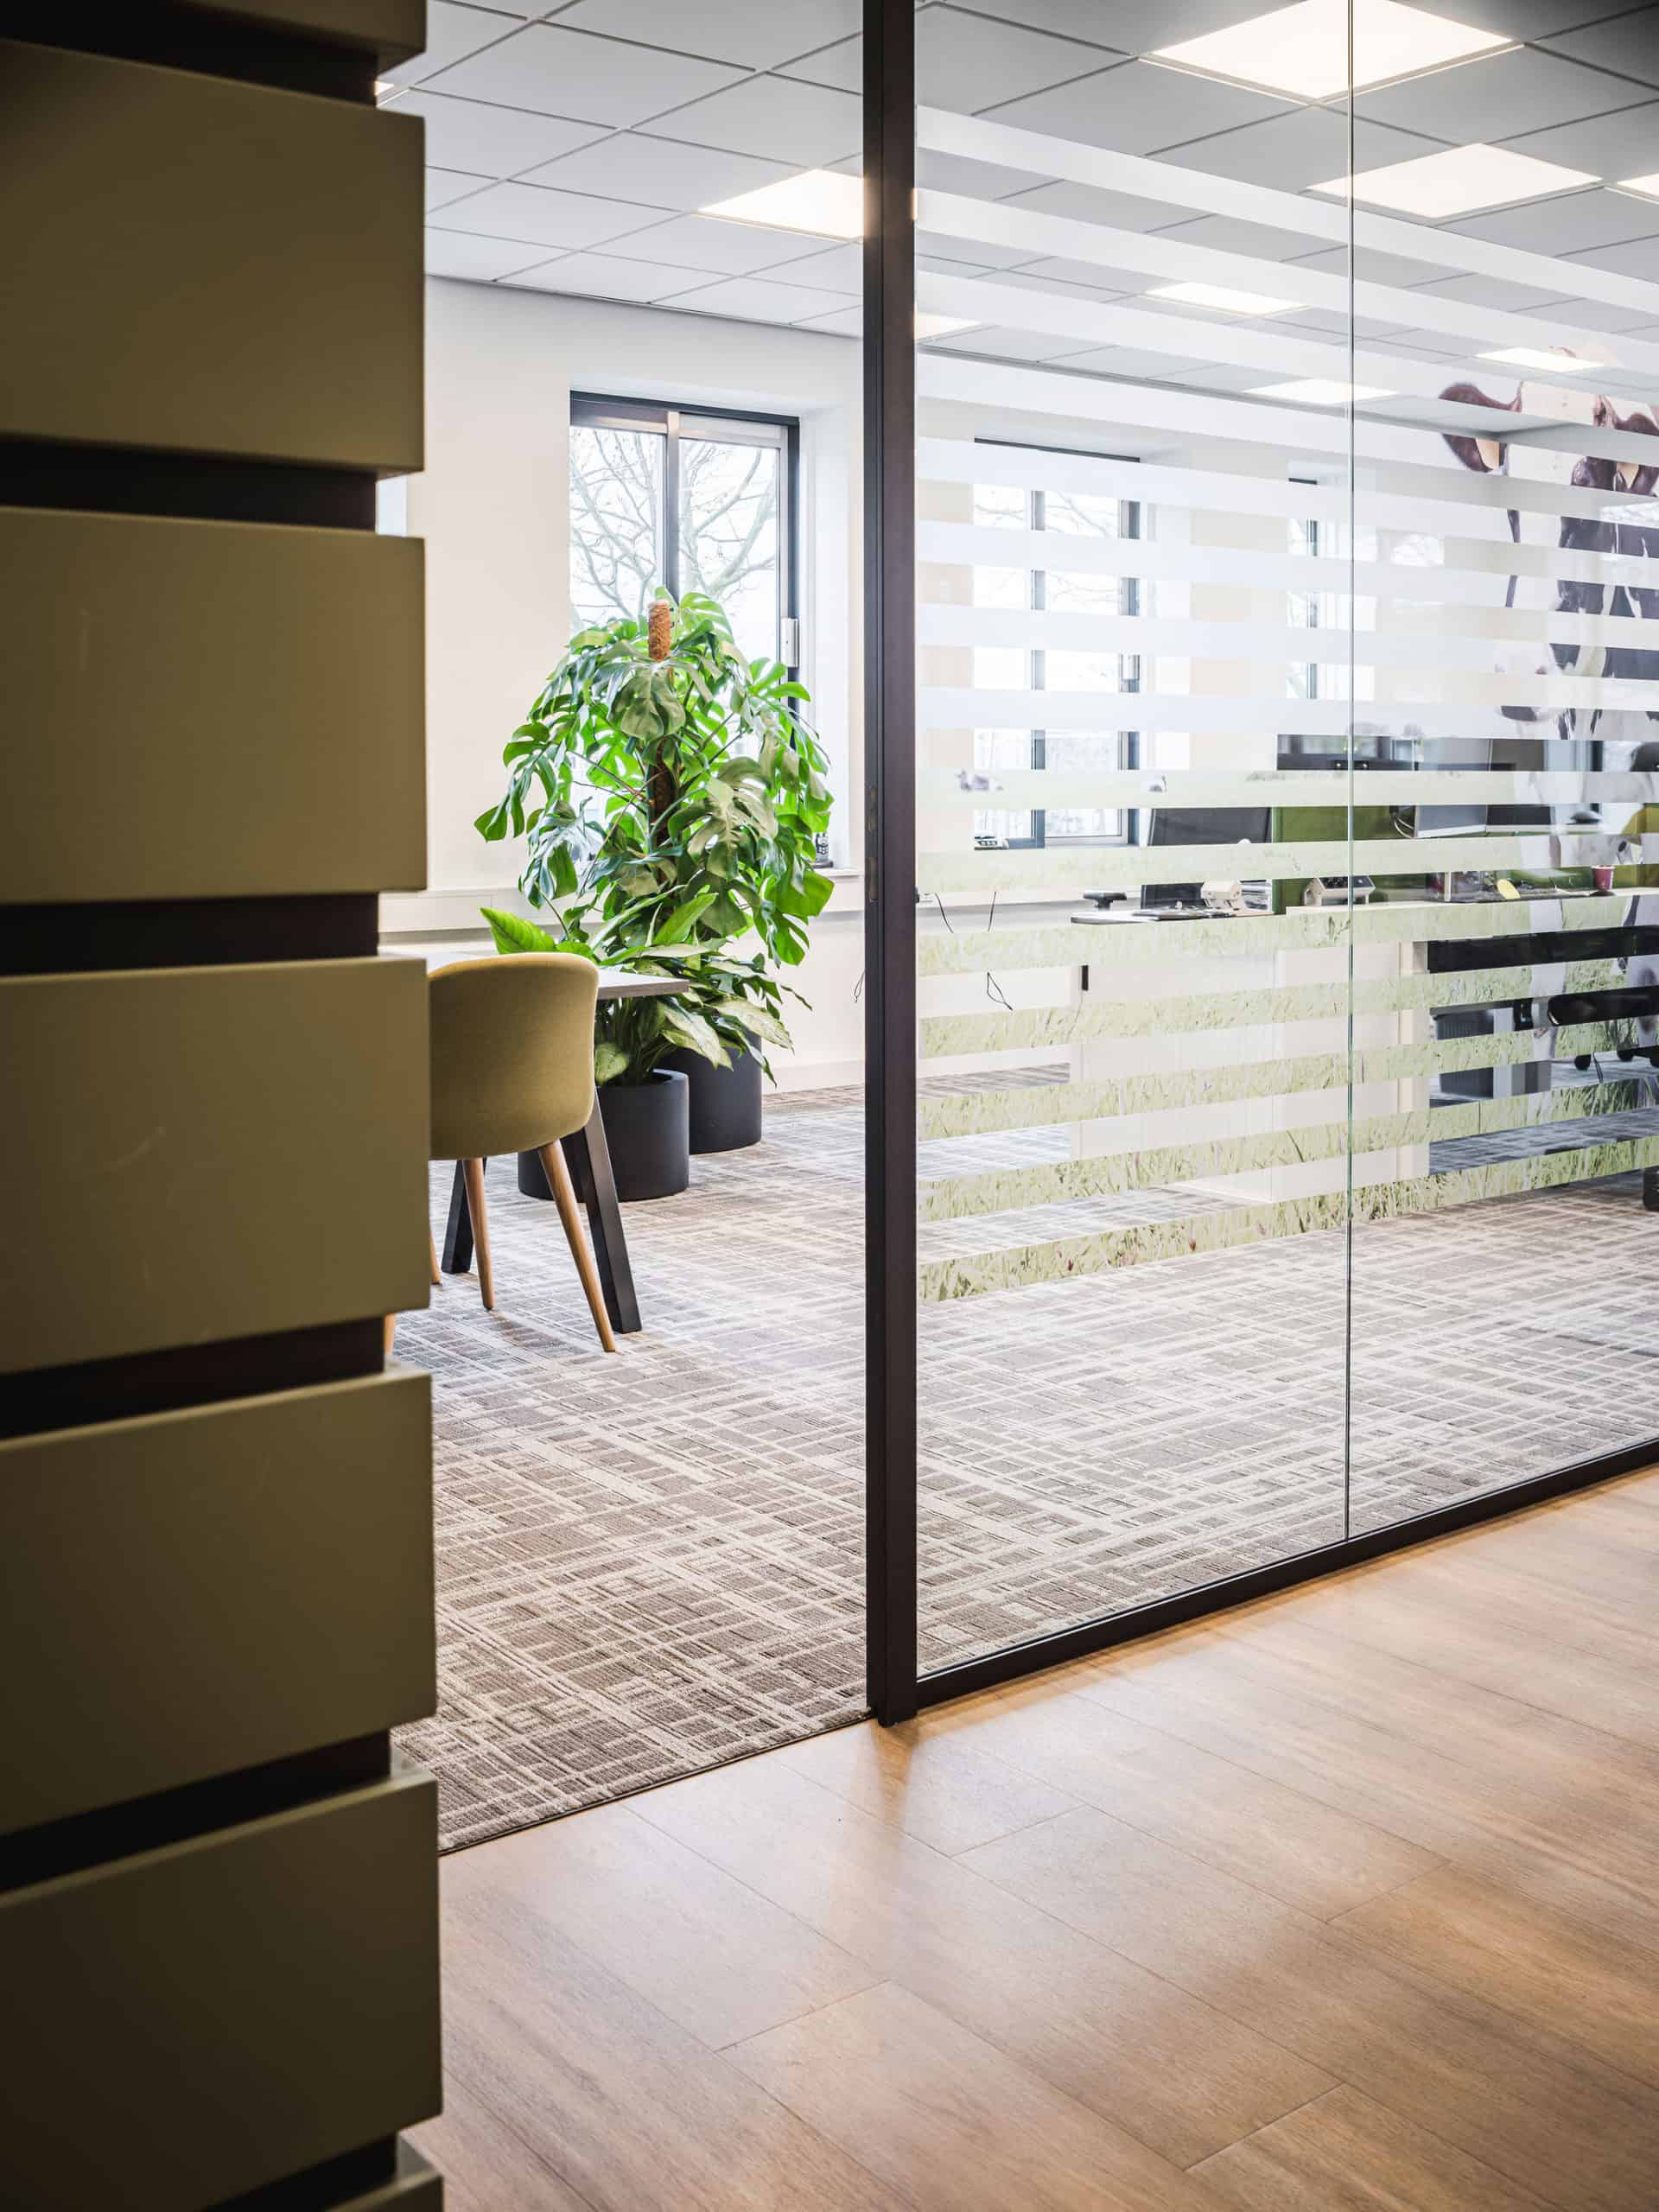 binnenhuisarchitect Wildenberg ontwerp kantoor COKZ PVC vloer Forbo Planeffect Meinema